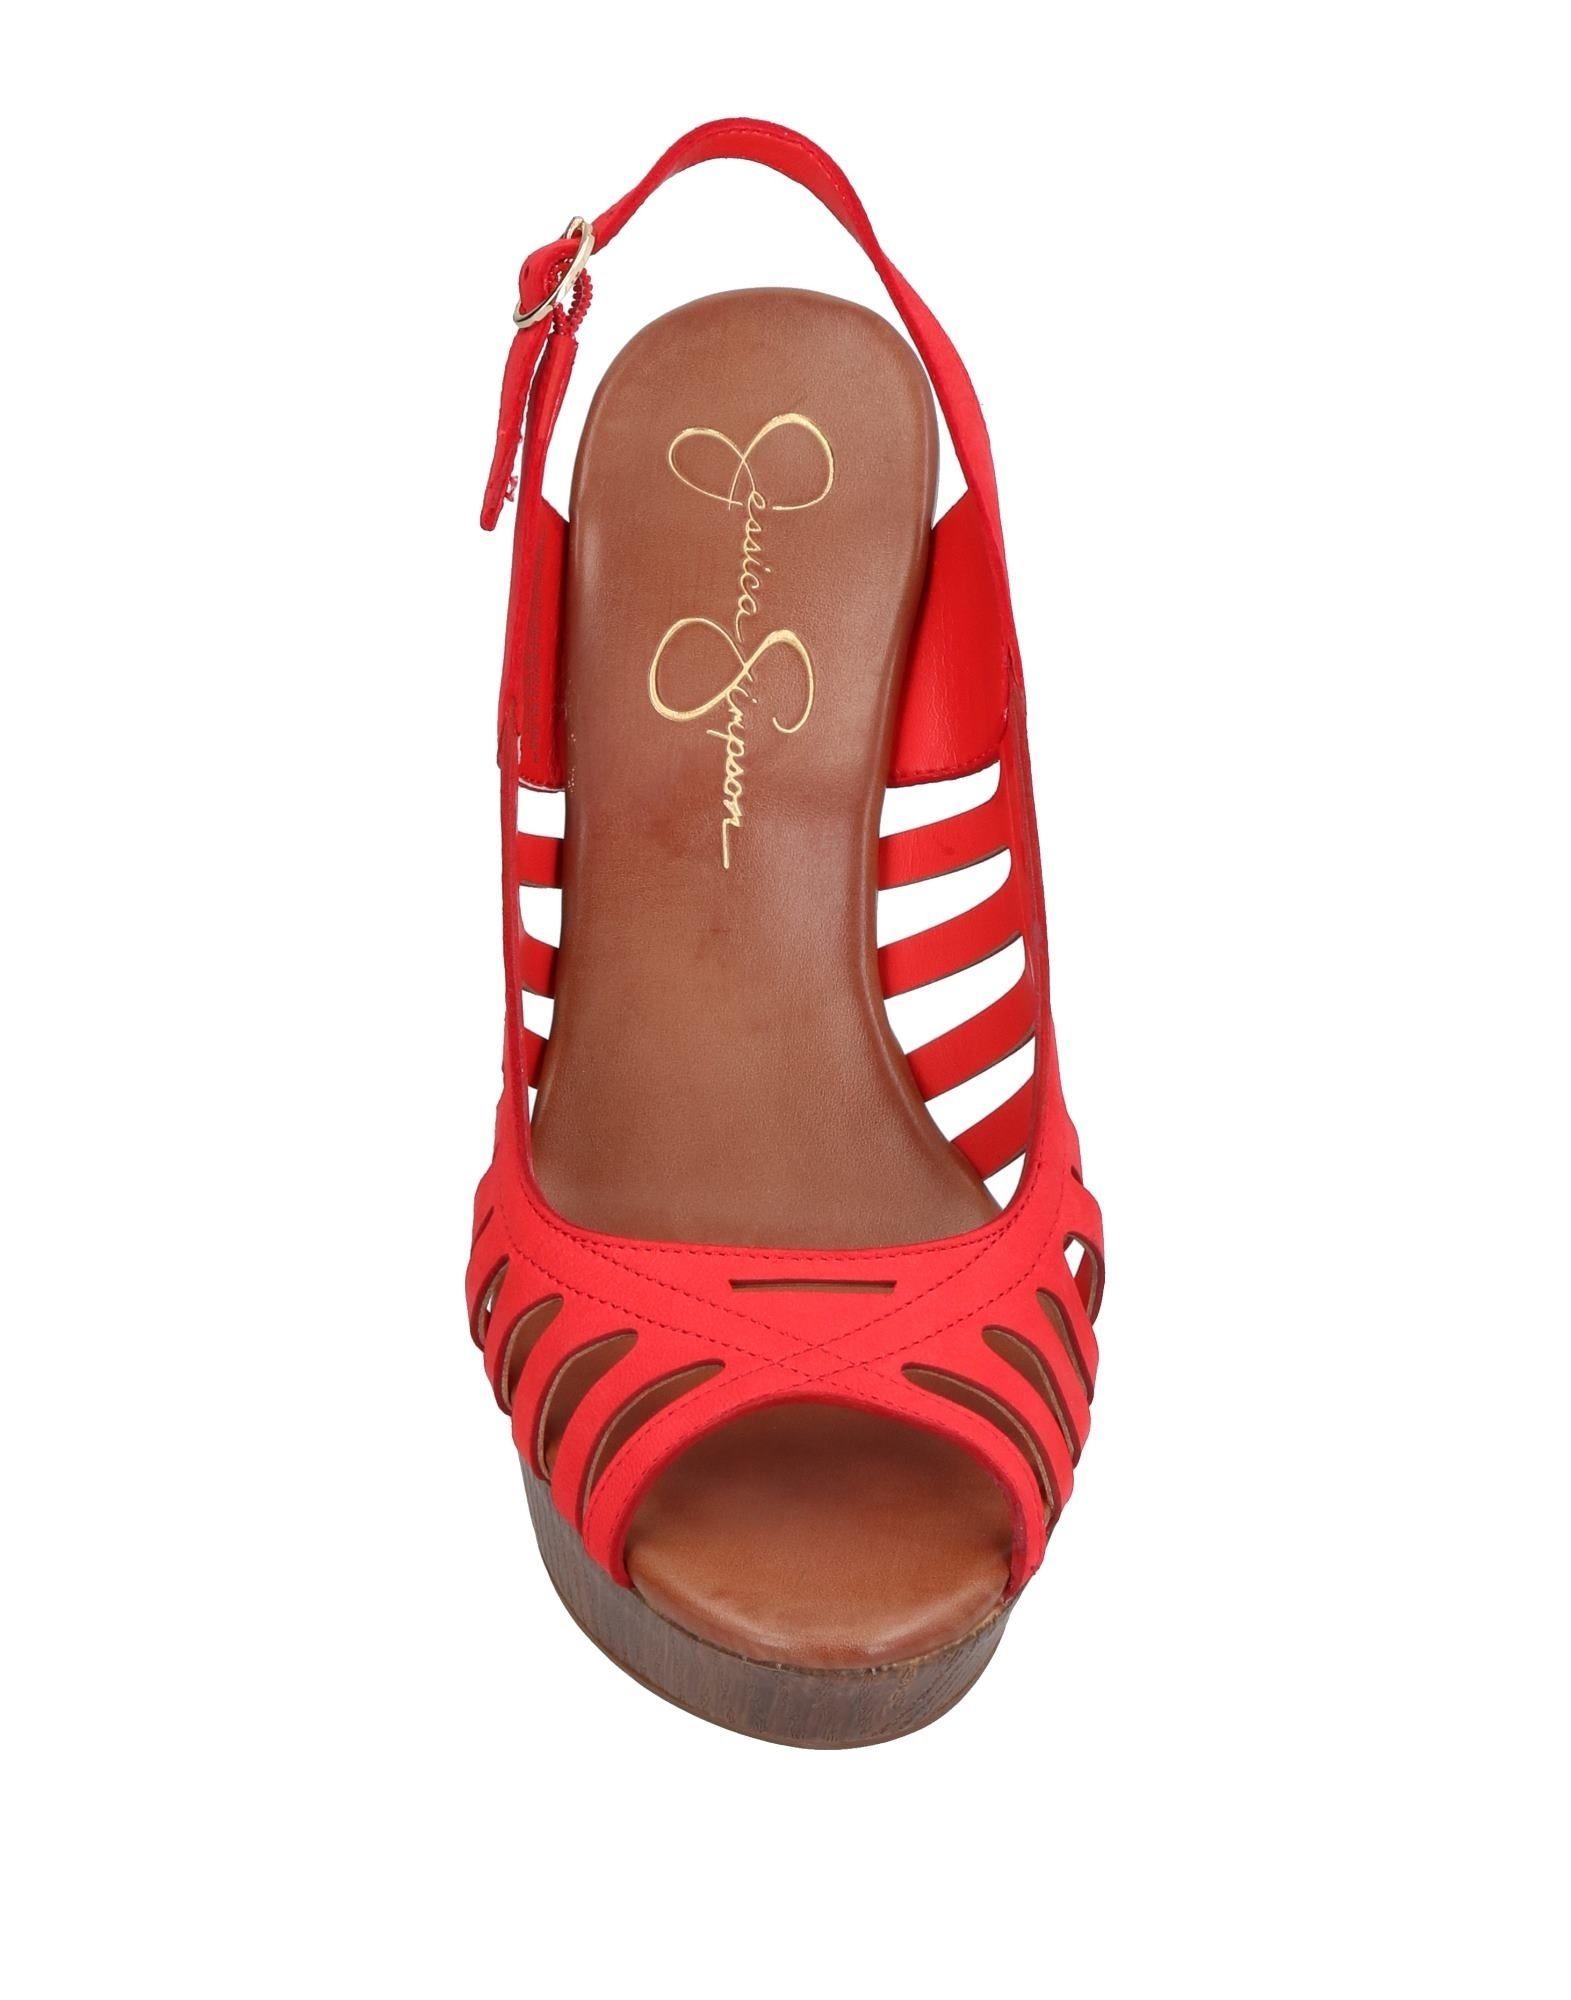 Jessica Simpson Sandalen Damen  11391178SC Gute Qualität beliebte Schuhe